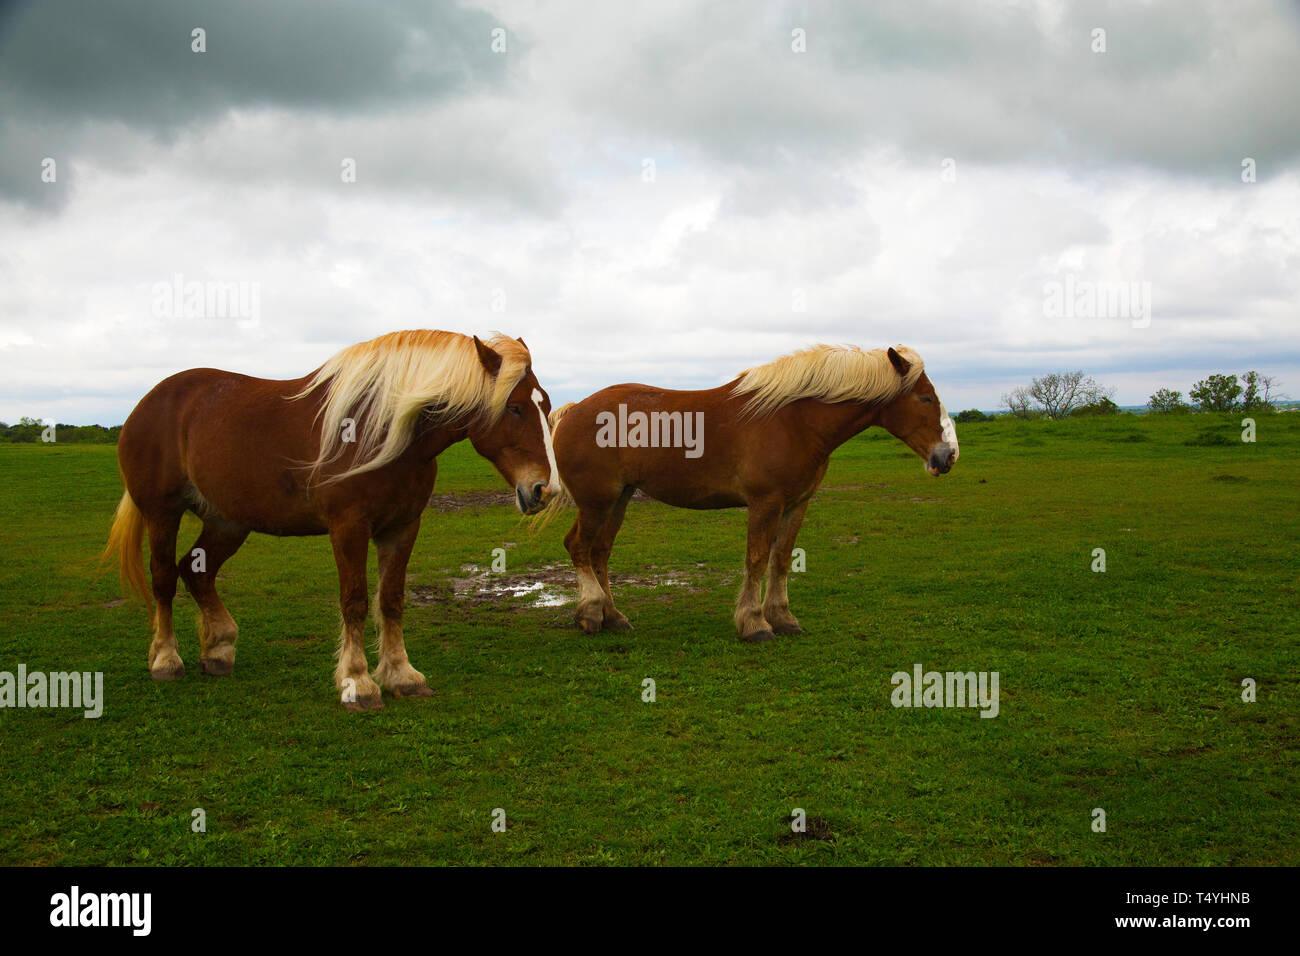 Draft Horses on the Bluebonnet Trail Near Ennis, Texas - Stock Image